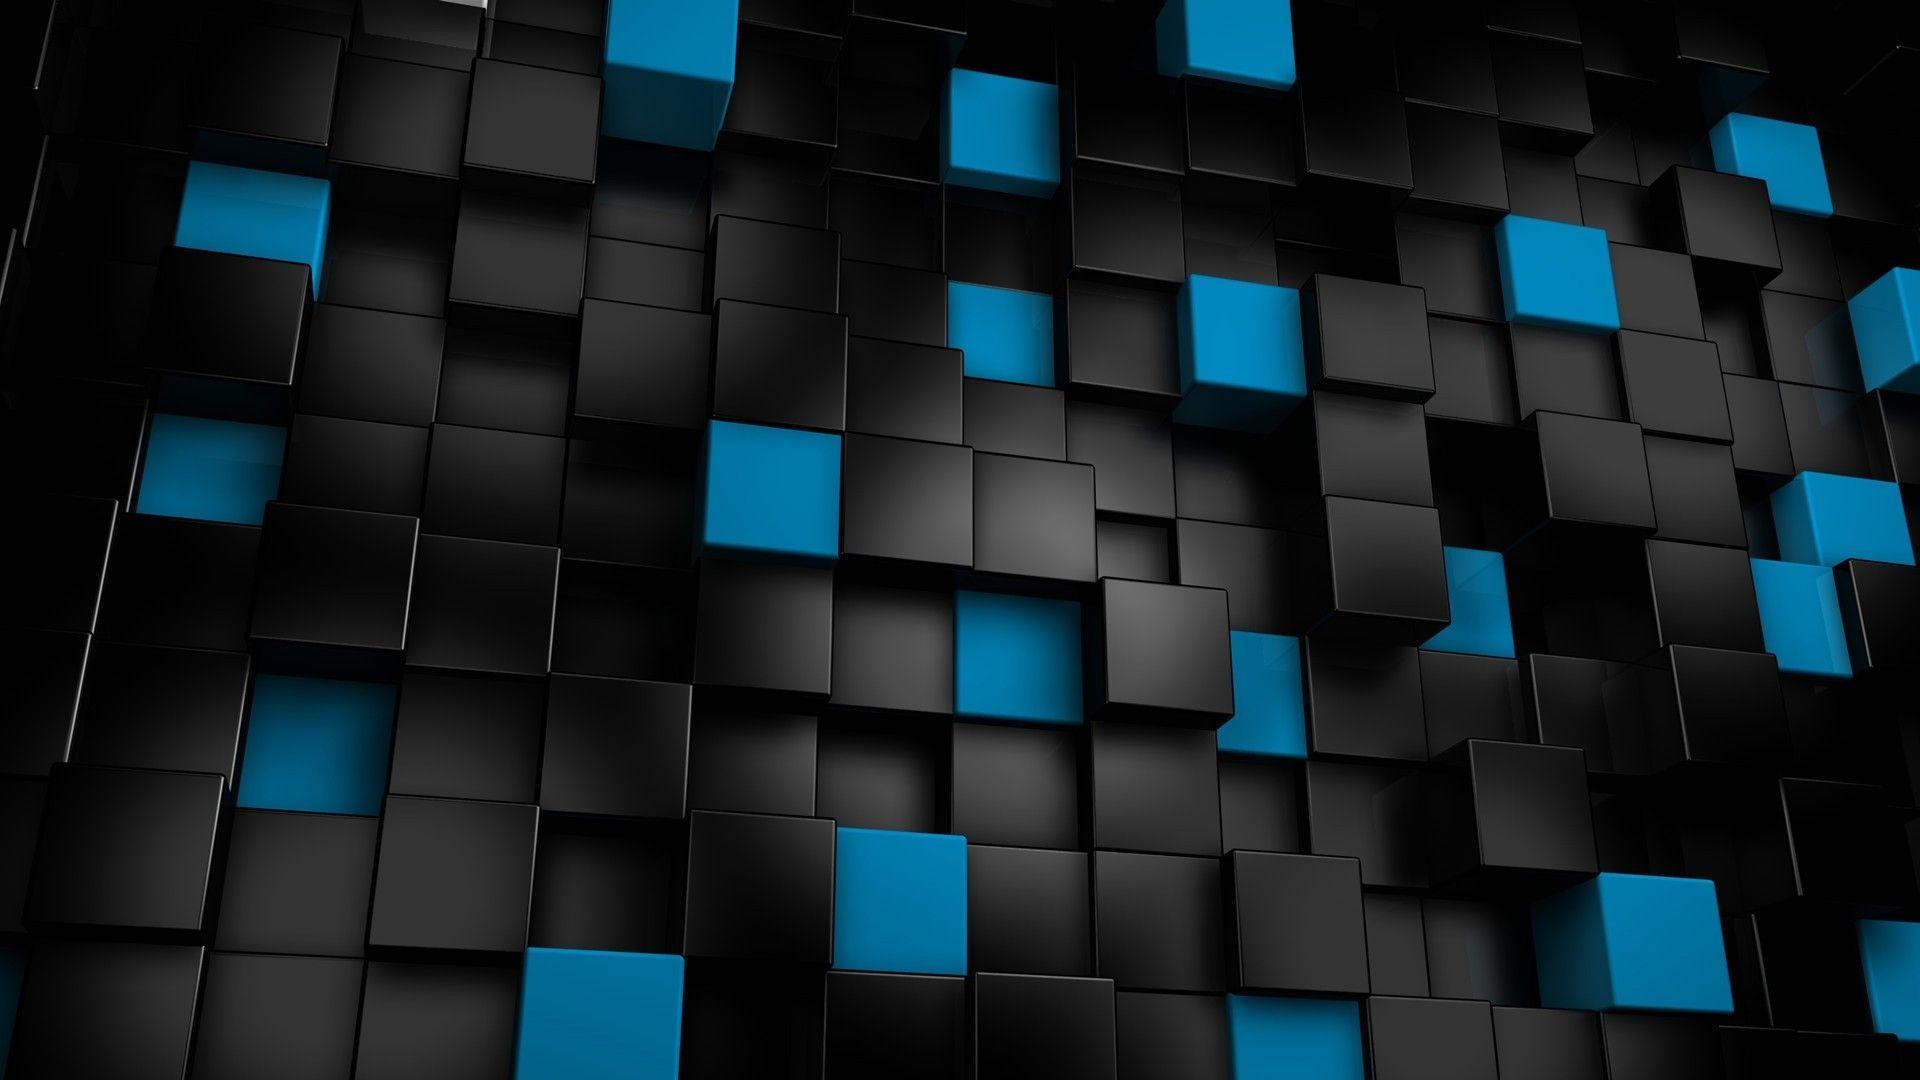 Backgrounds 3D - Wallpaper Cave